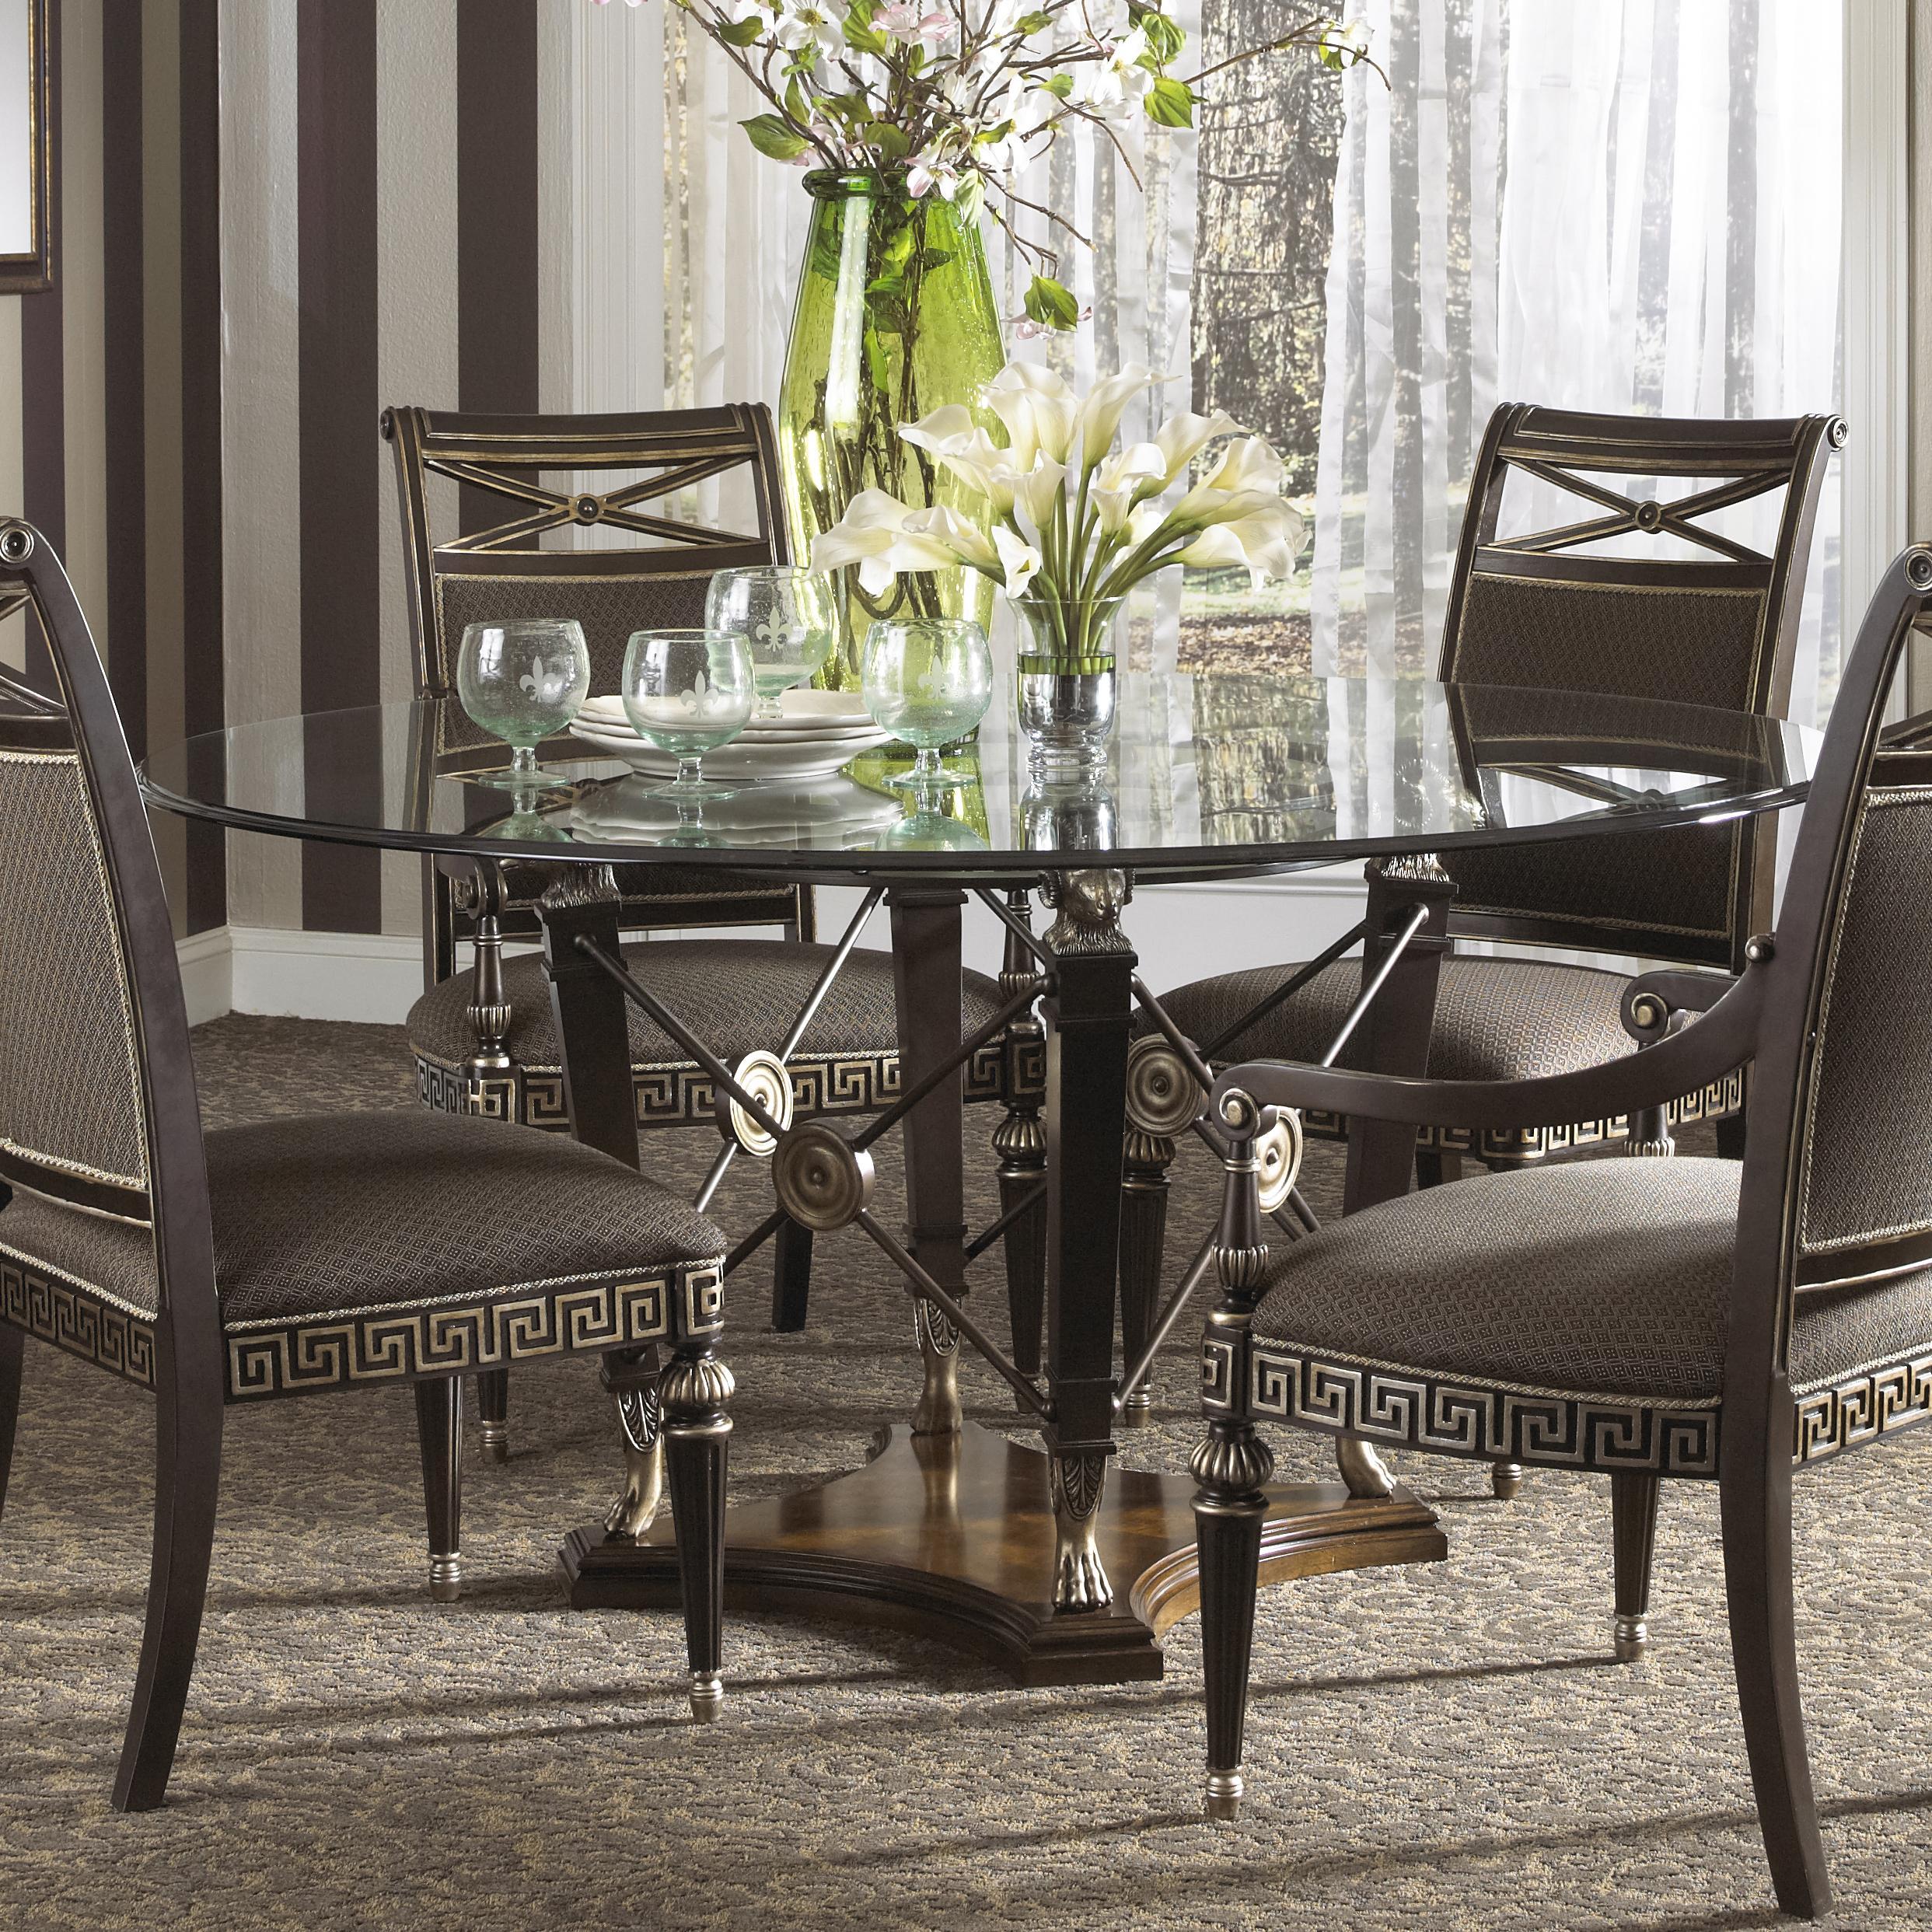 37 Elegant Round Dining Table Ideas | Table Decorating Ideas